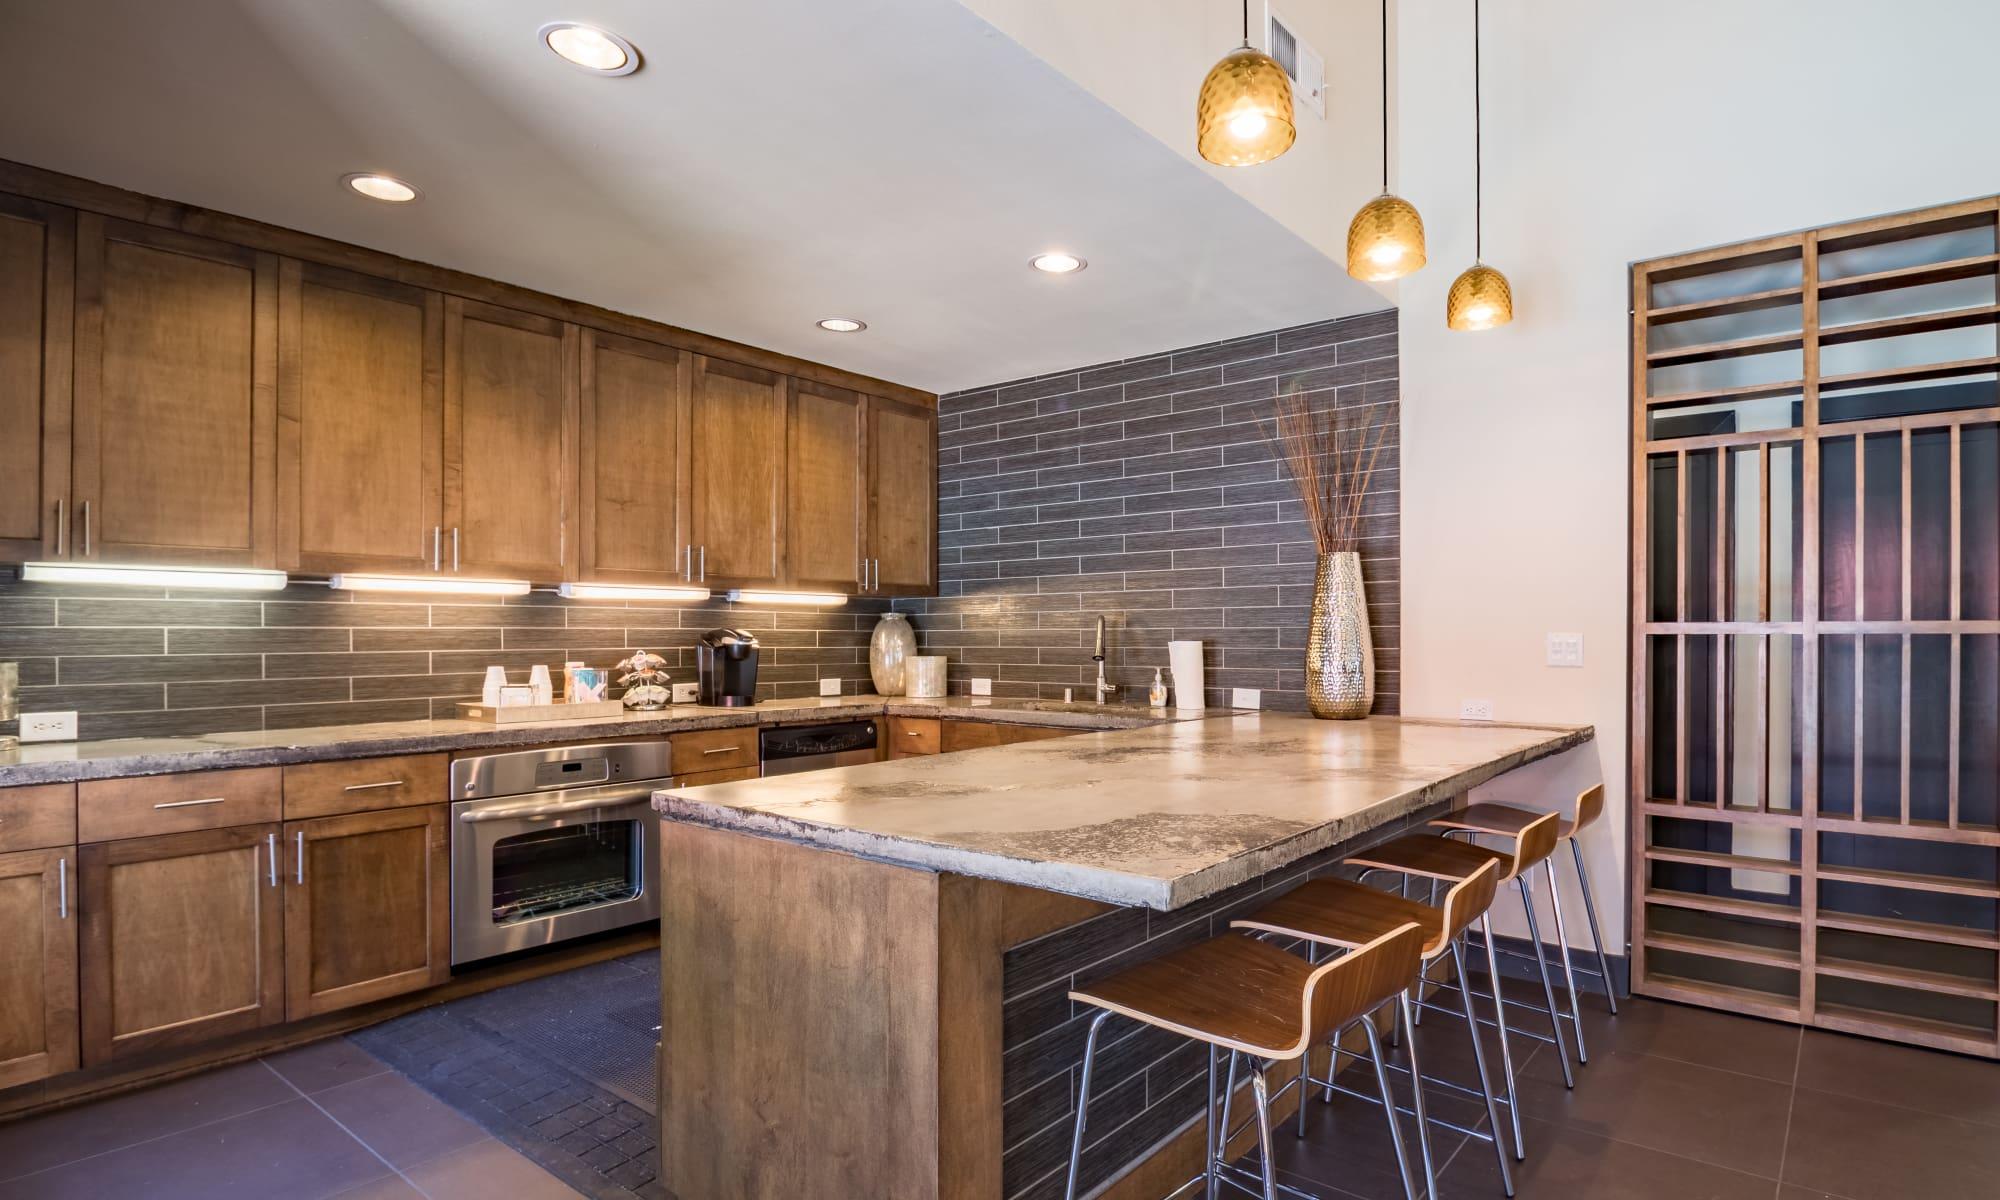 South Allen Tx Apartments For Rent Presidio Apartments